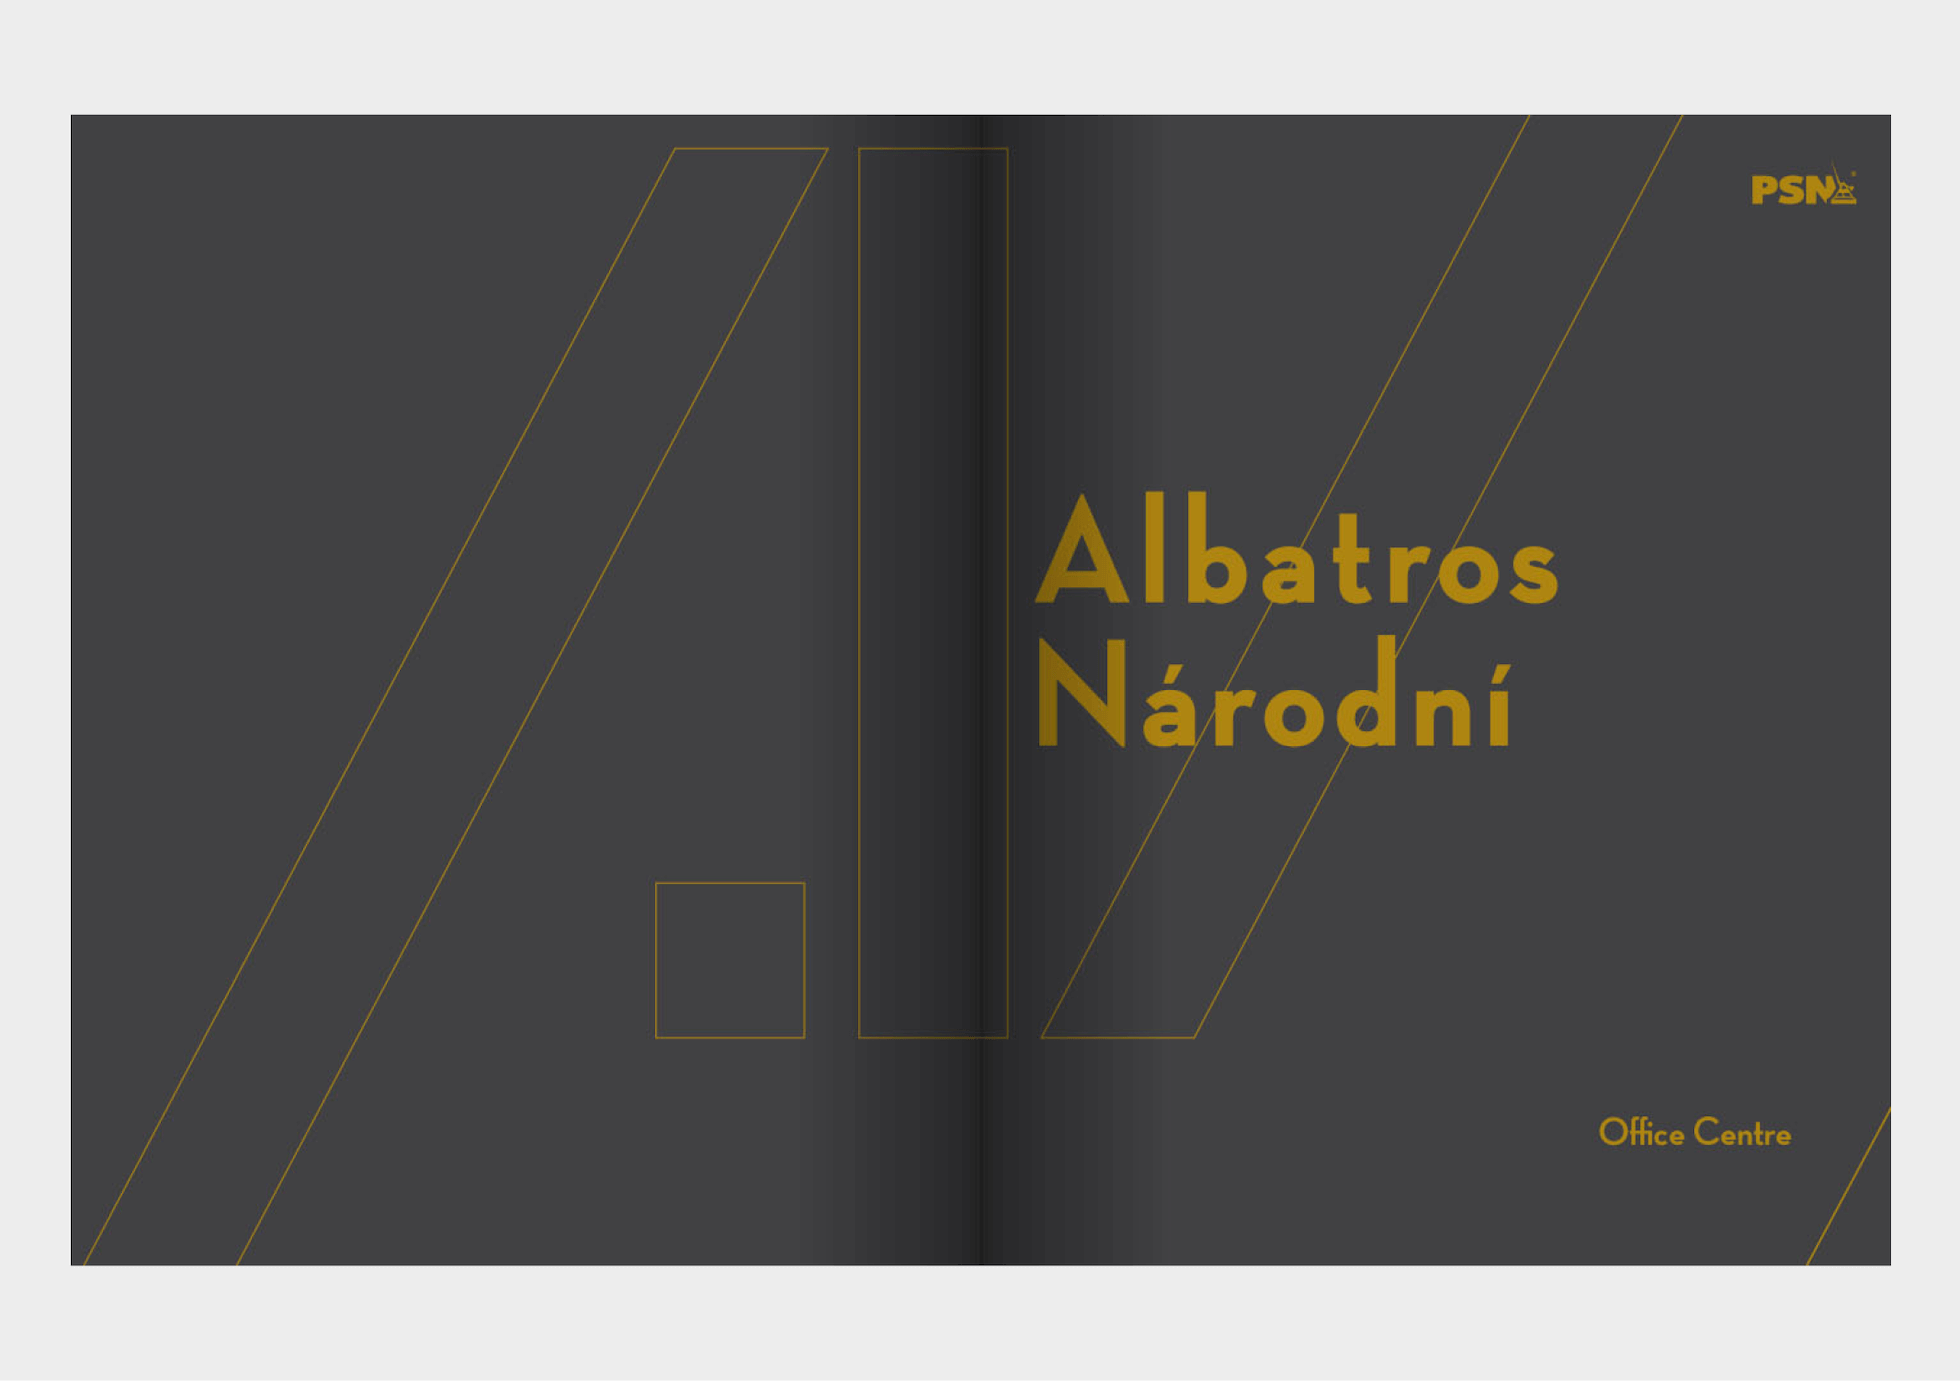 Albatros Narodni brozura